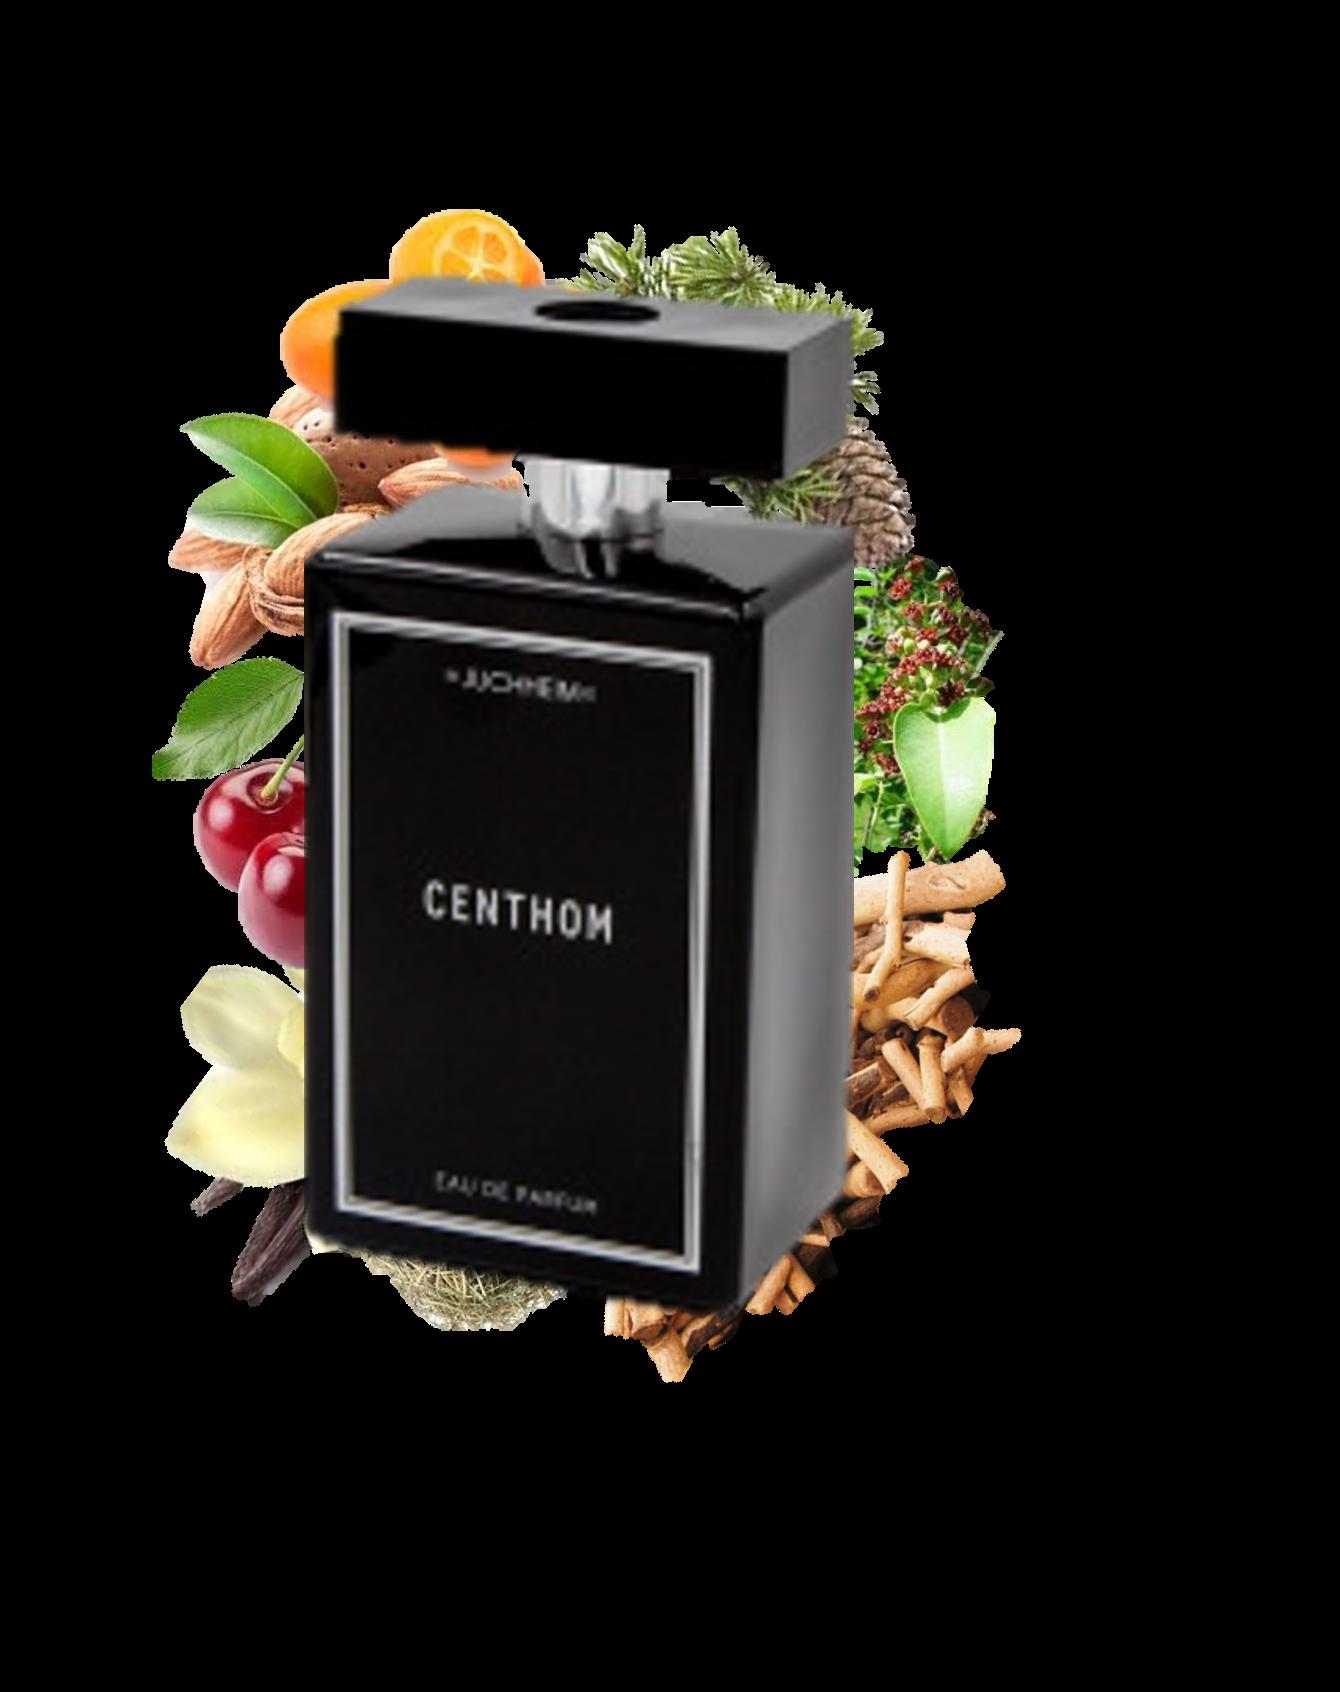 CENTHOM мужской парфюм